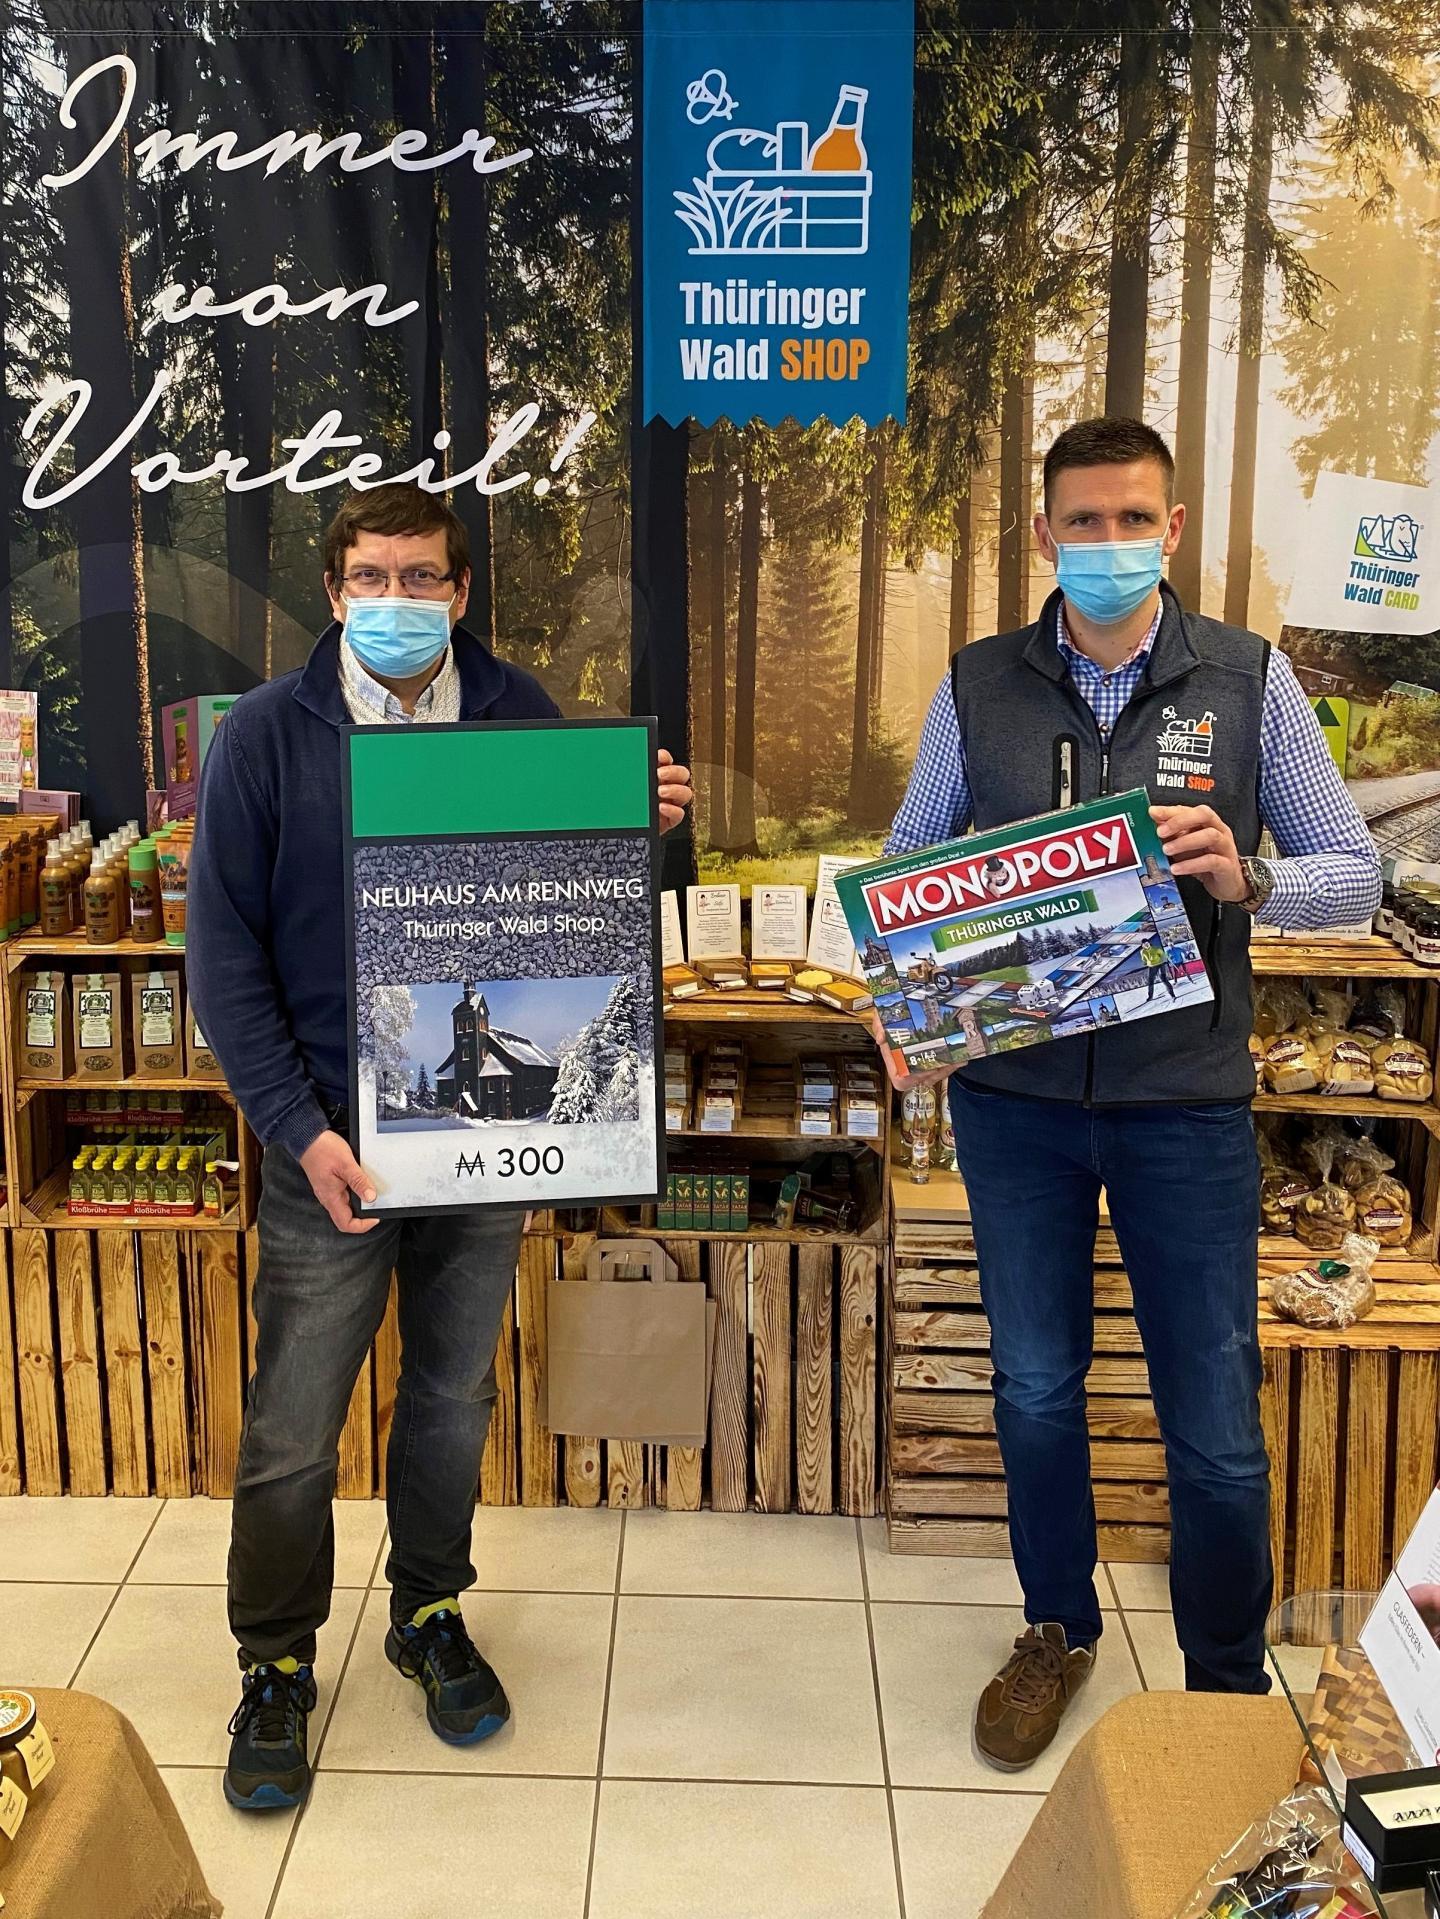 Bürgermeister Uwe Scheler und Geschäftsführer Jörg Seifert am 05.03.2021 im Thüringer Wald Shop